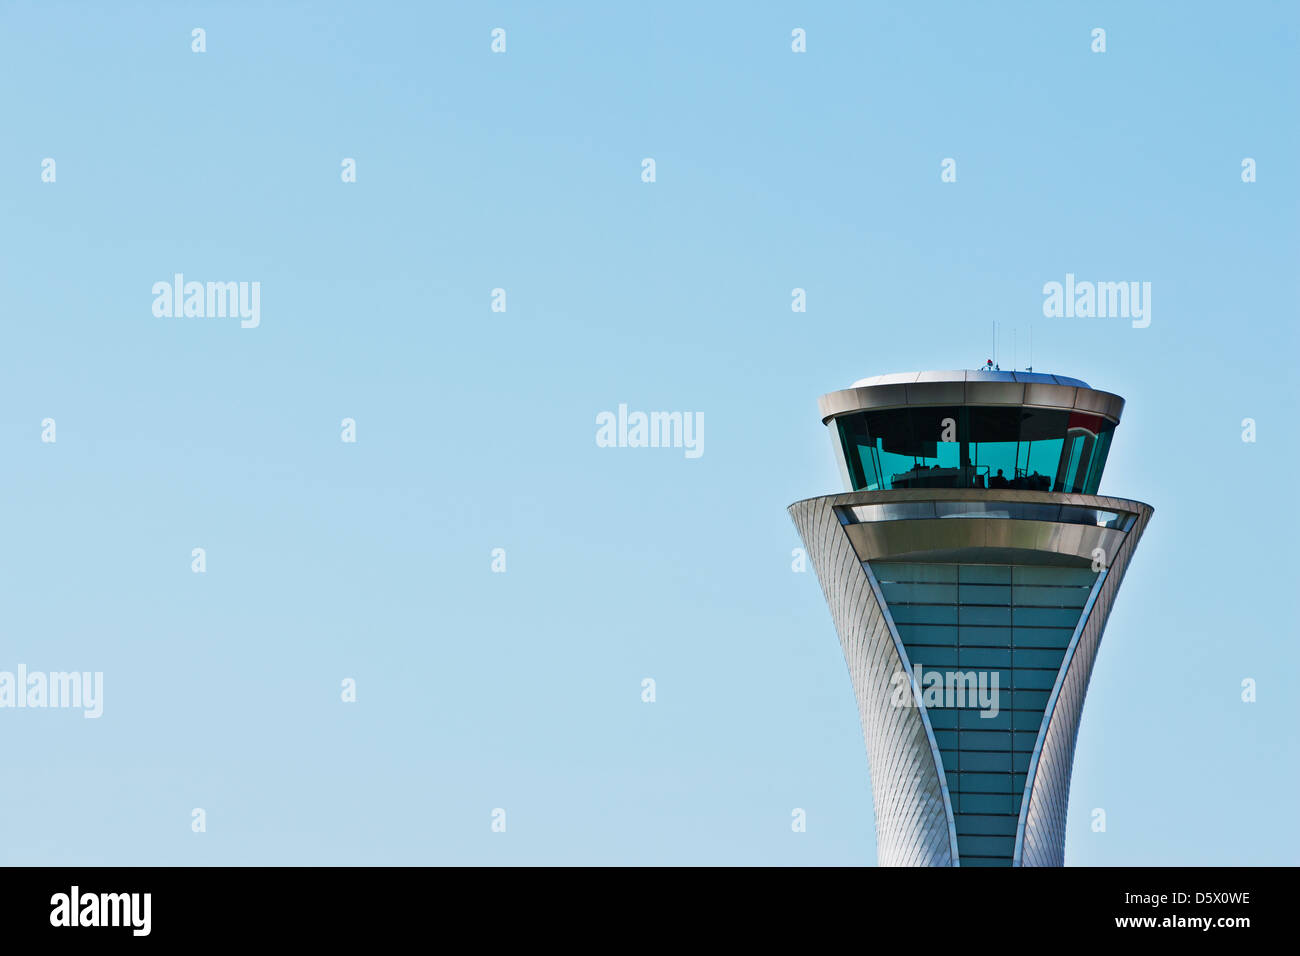 Air Traffic Control Building Stock Photos & Air Traffic Control ...